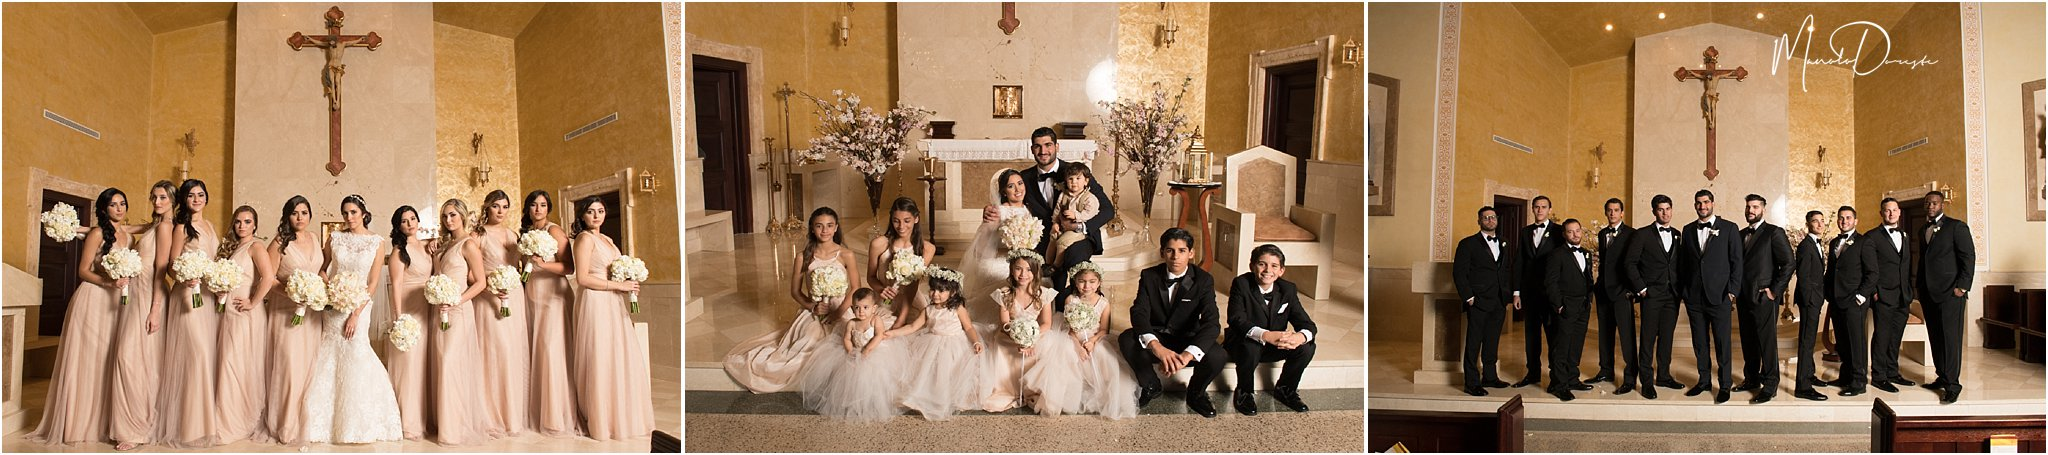 00940_ManoloDoreste_InFocusStudios_Wedding_Family_Photography_Miami_MiamiPhotographer.jpg